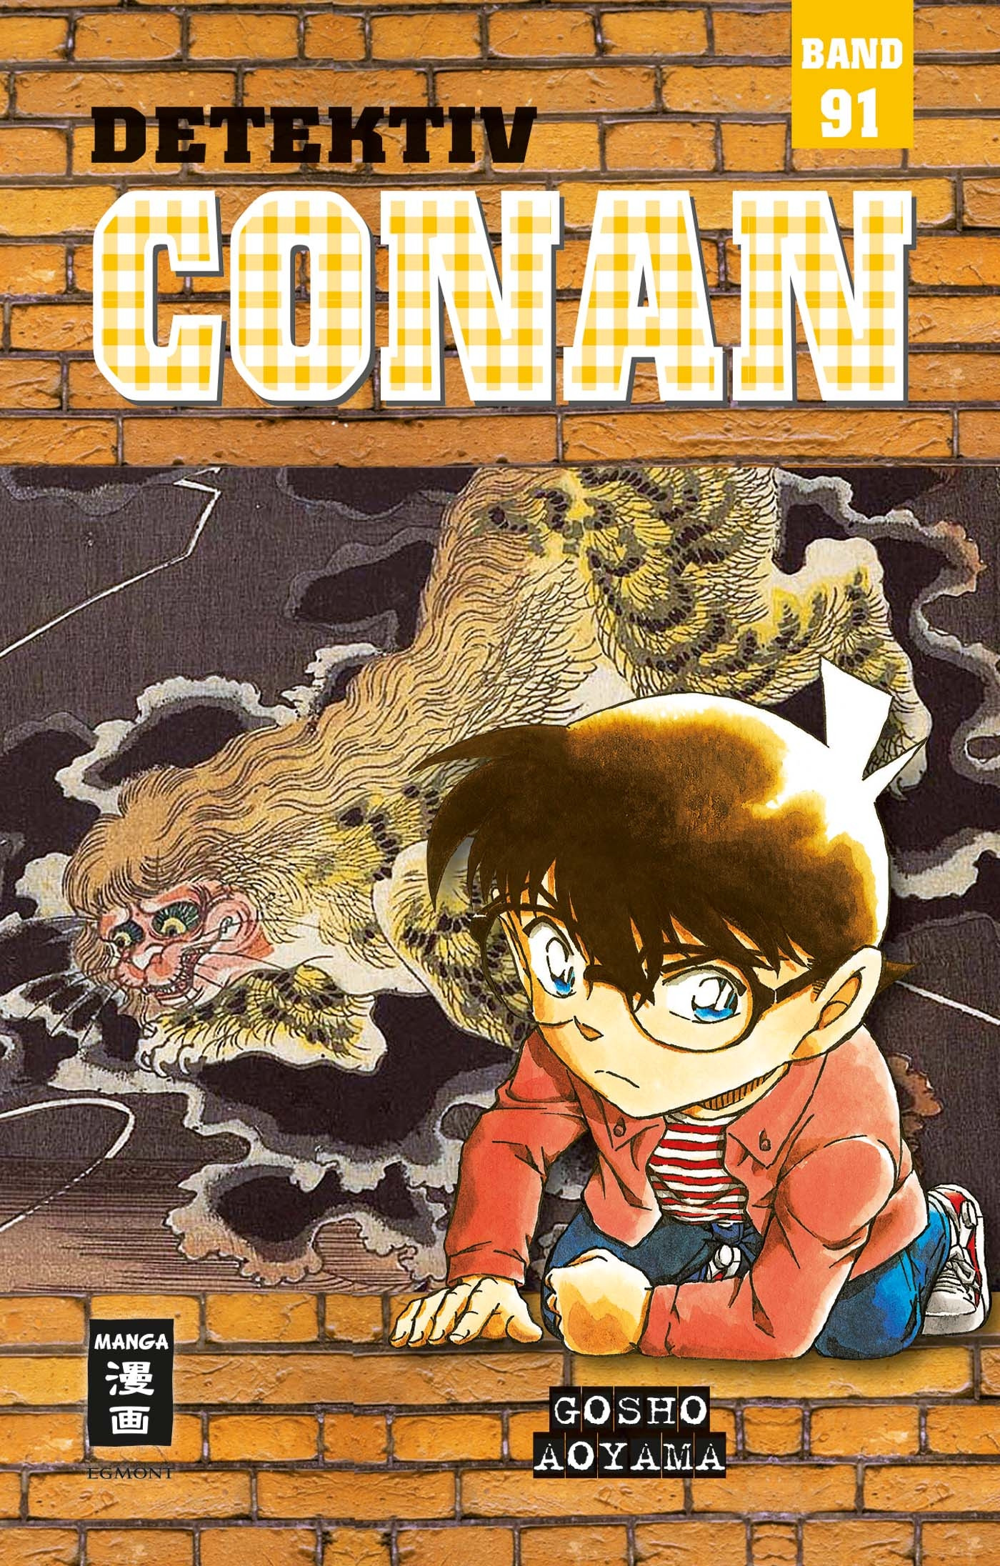 Detektiv Conan 91 Manga